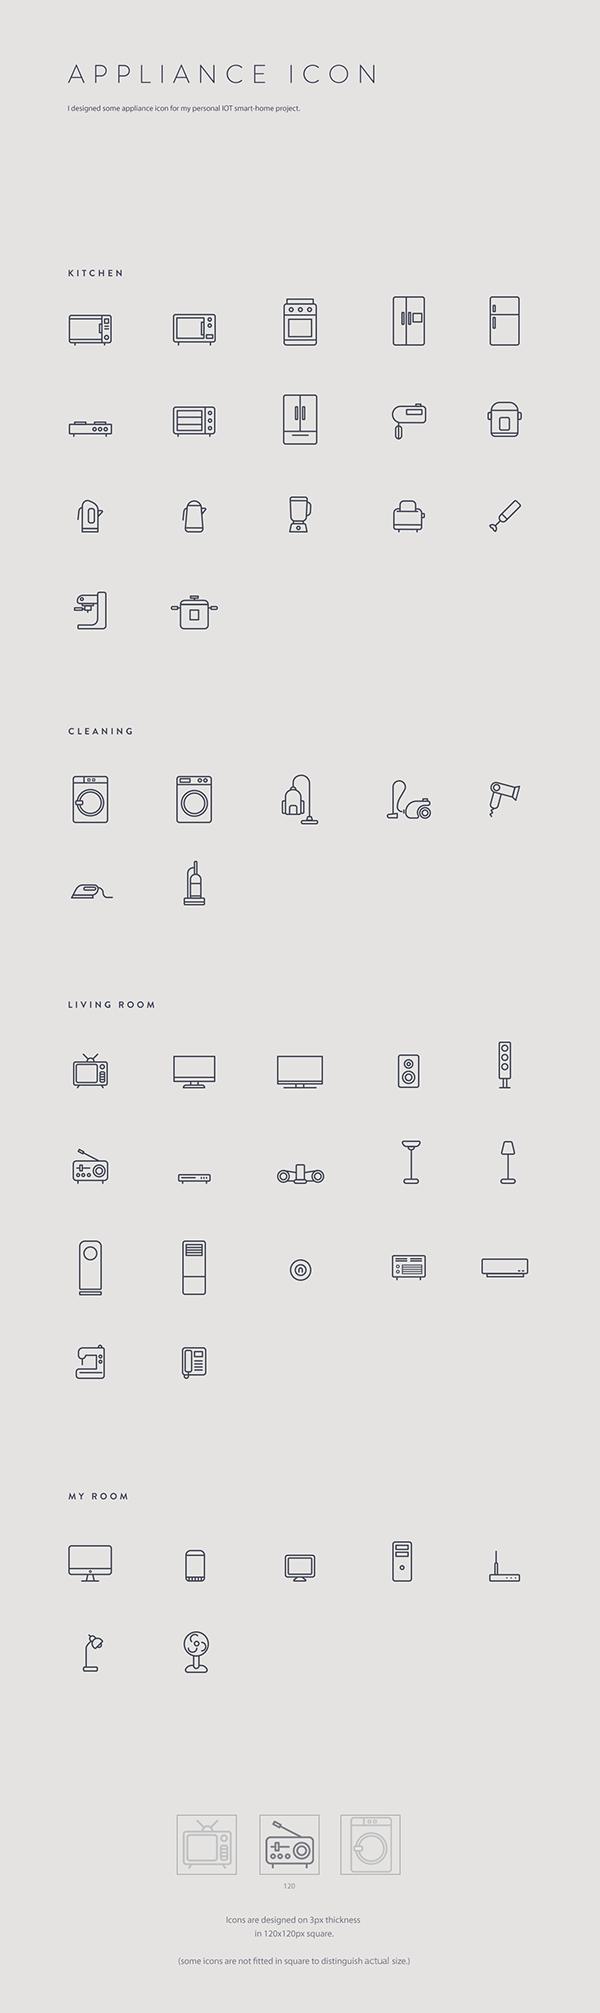 Appliance Icon Design on Behance